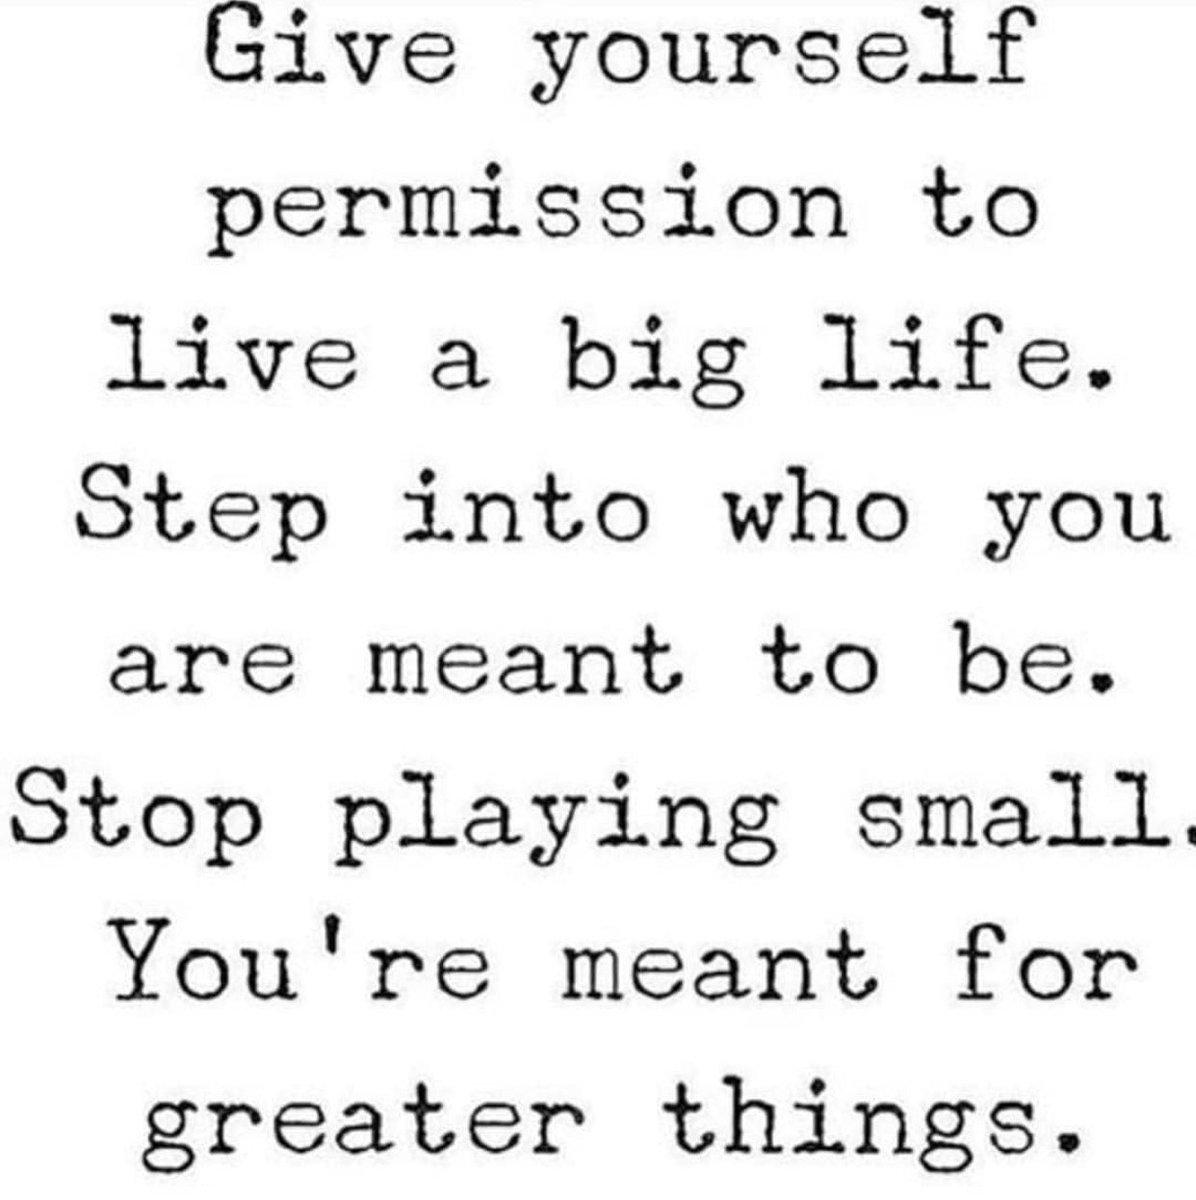 Motivational Monday's photo on #motivationmonday